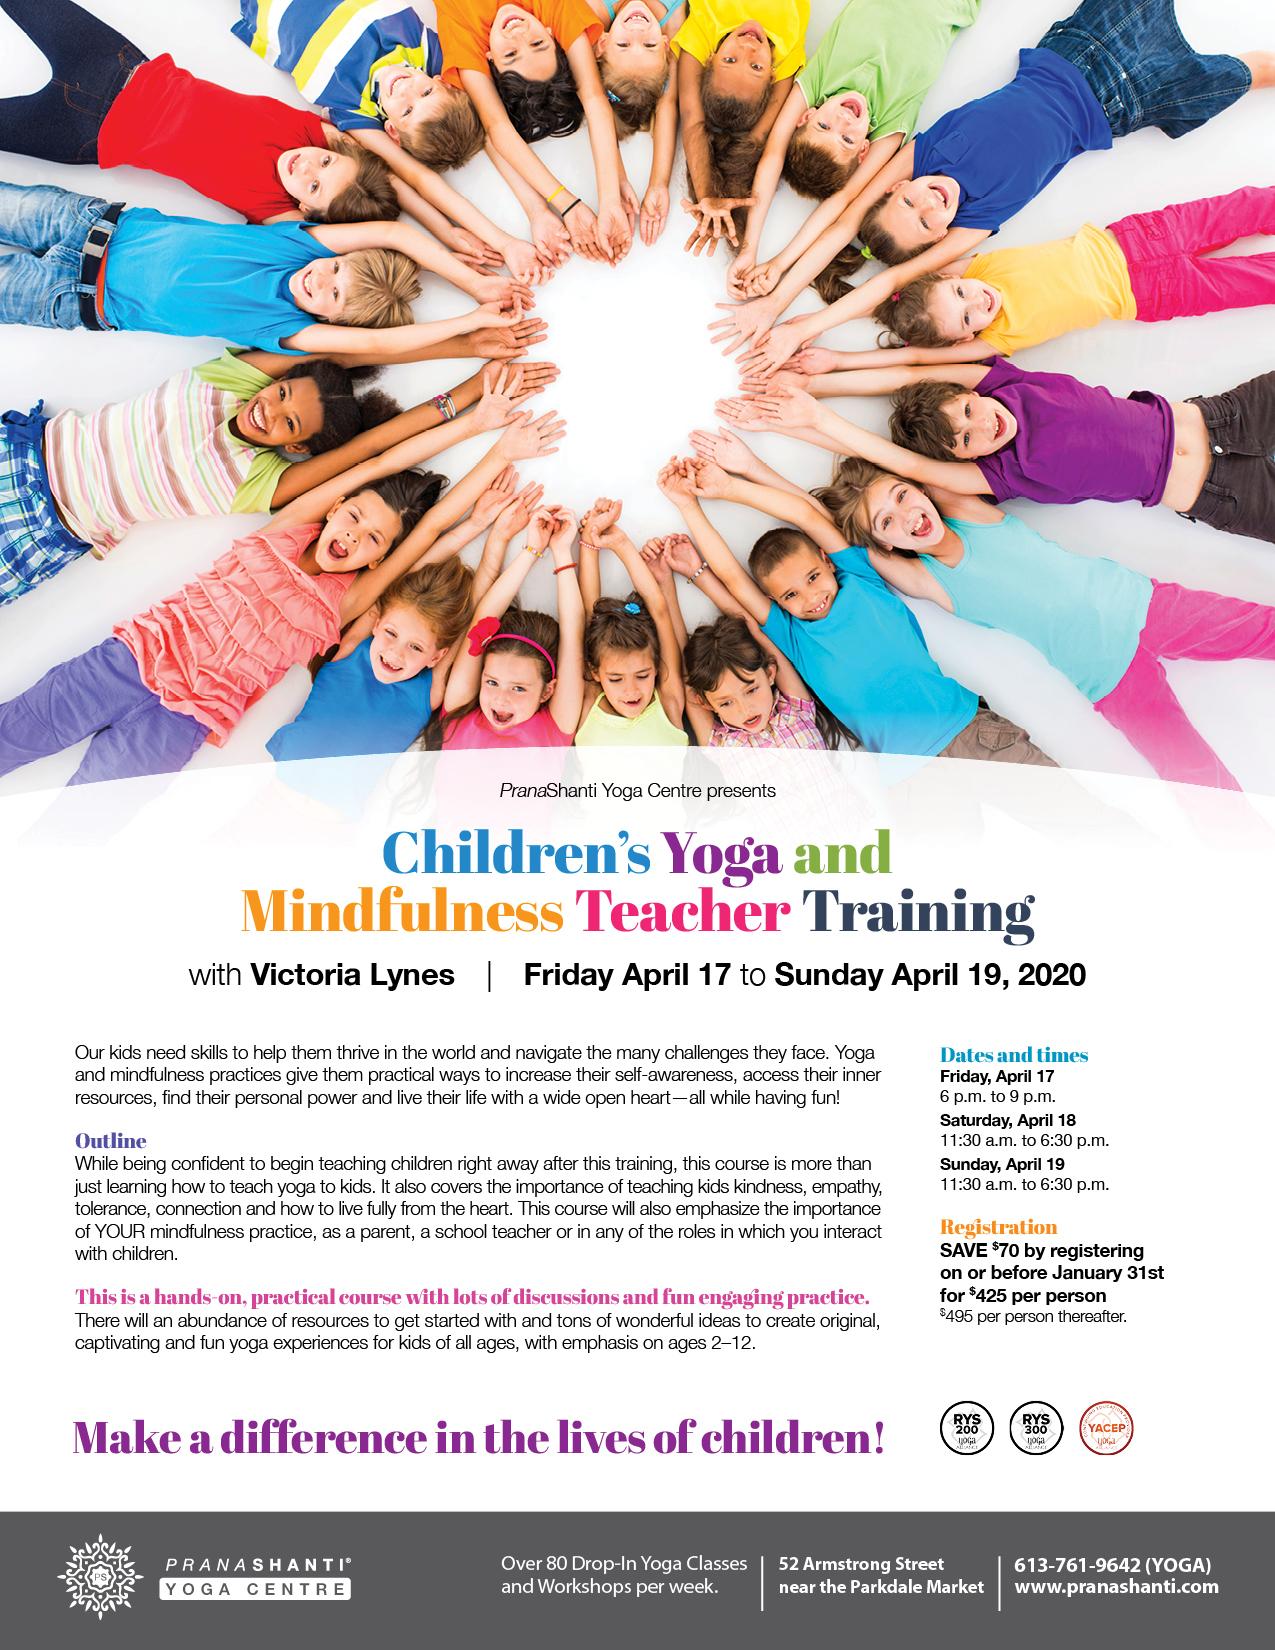 Children's Yoga and Mindfulness Teacher Training